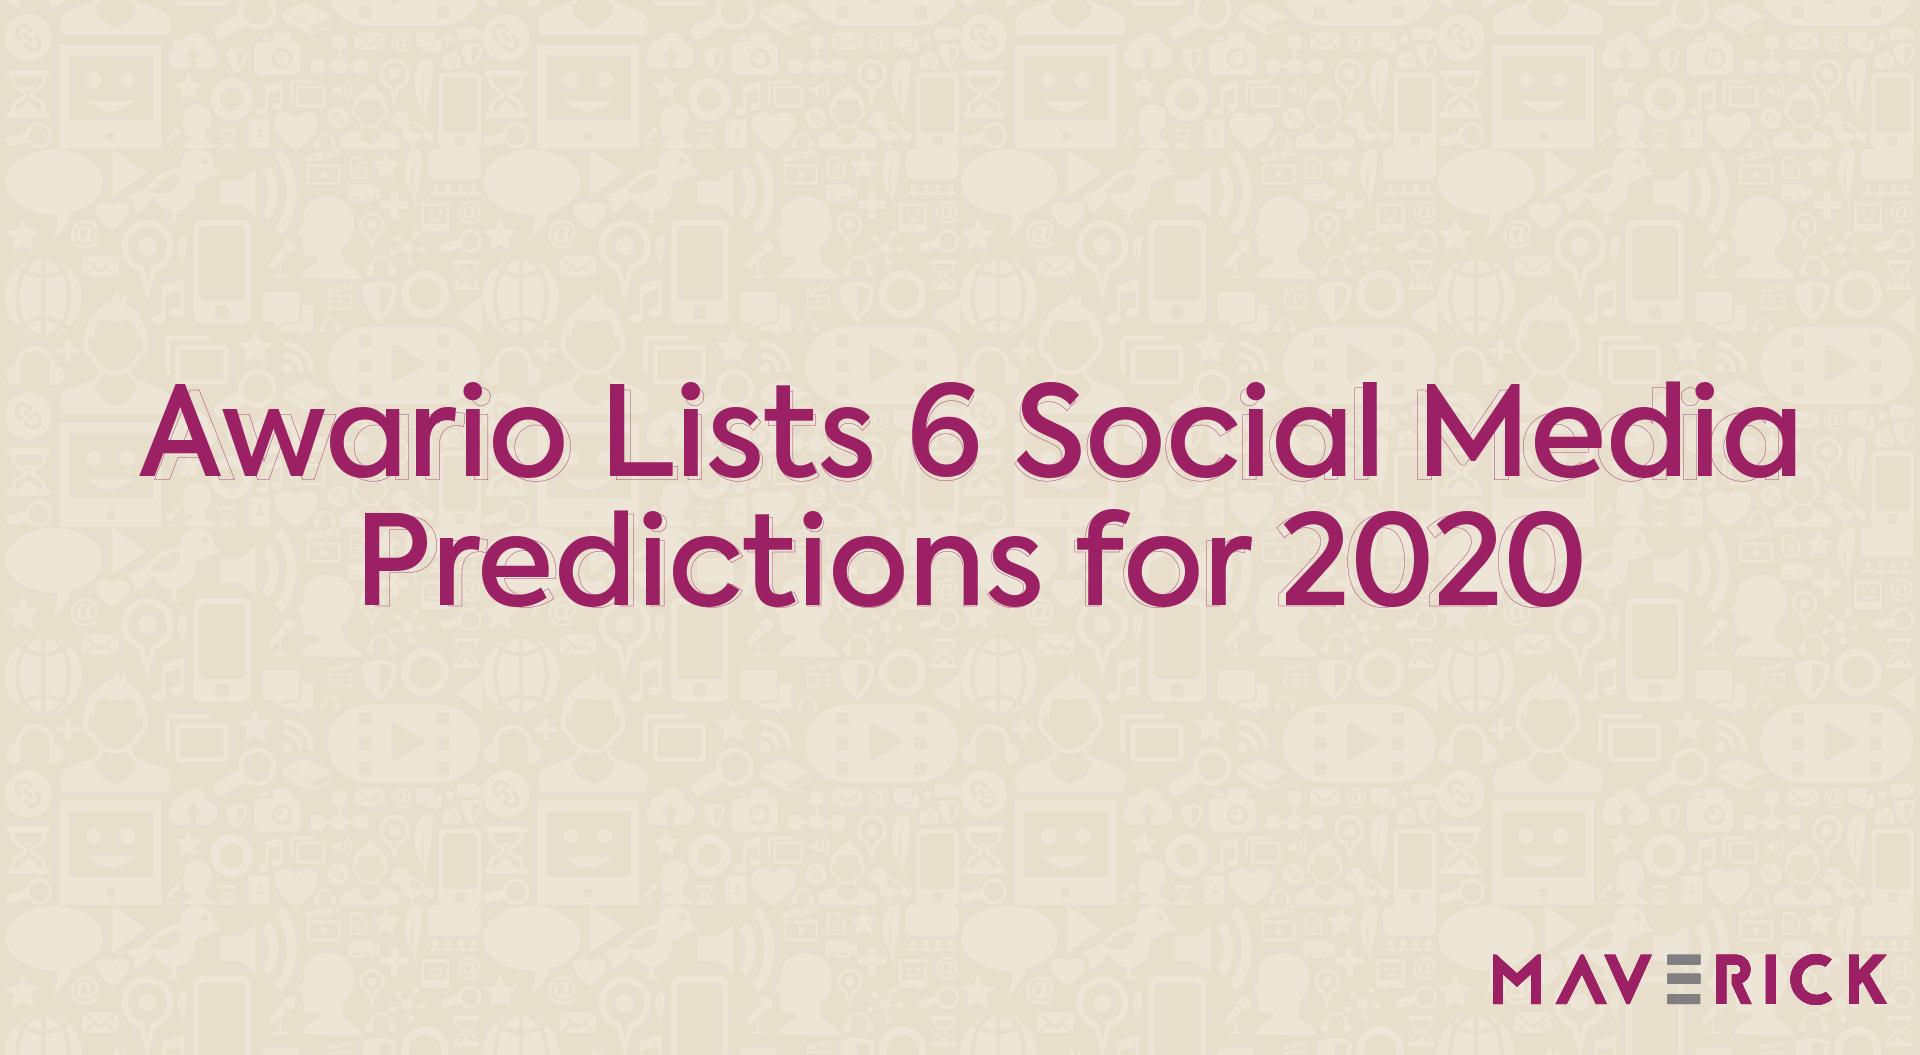 Social Media Predictions for 2020